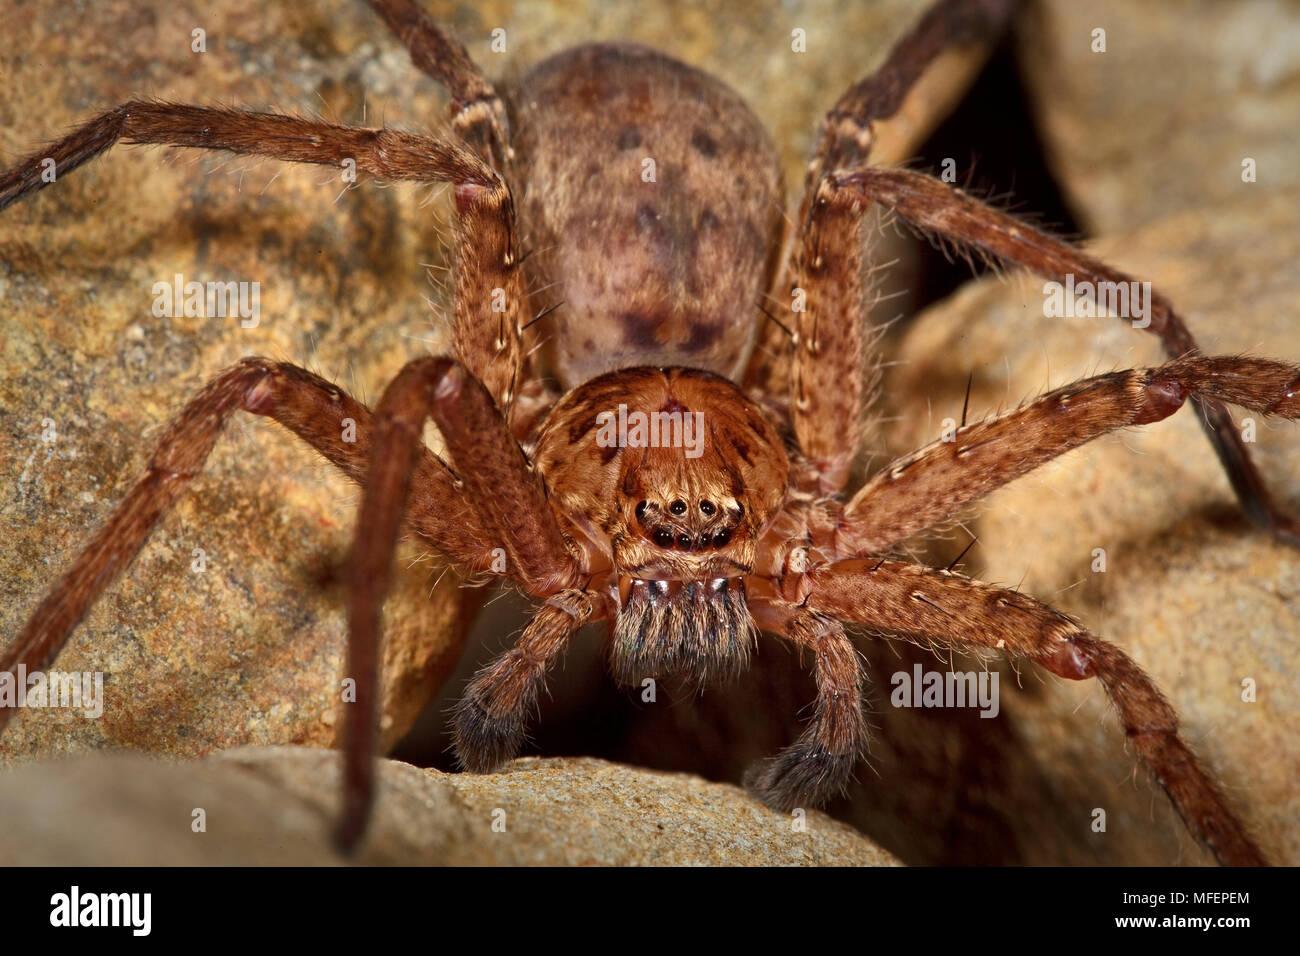 Brown Huntsman Spider (Heteropoda cervina), Fam  Sparassidae